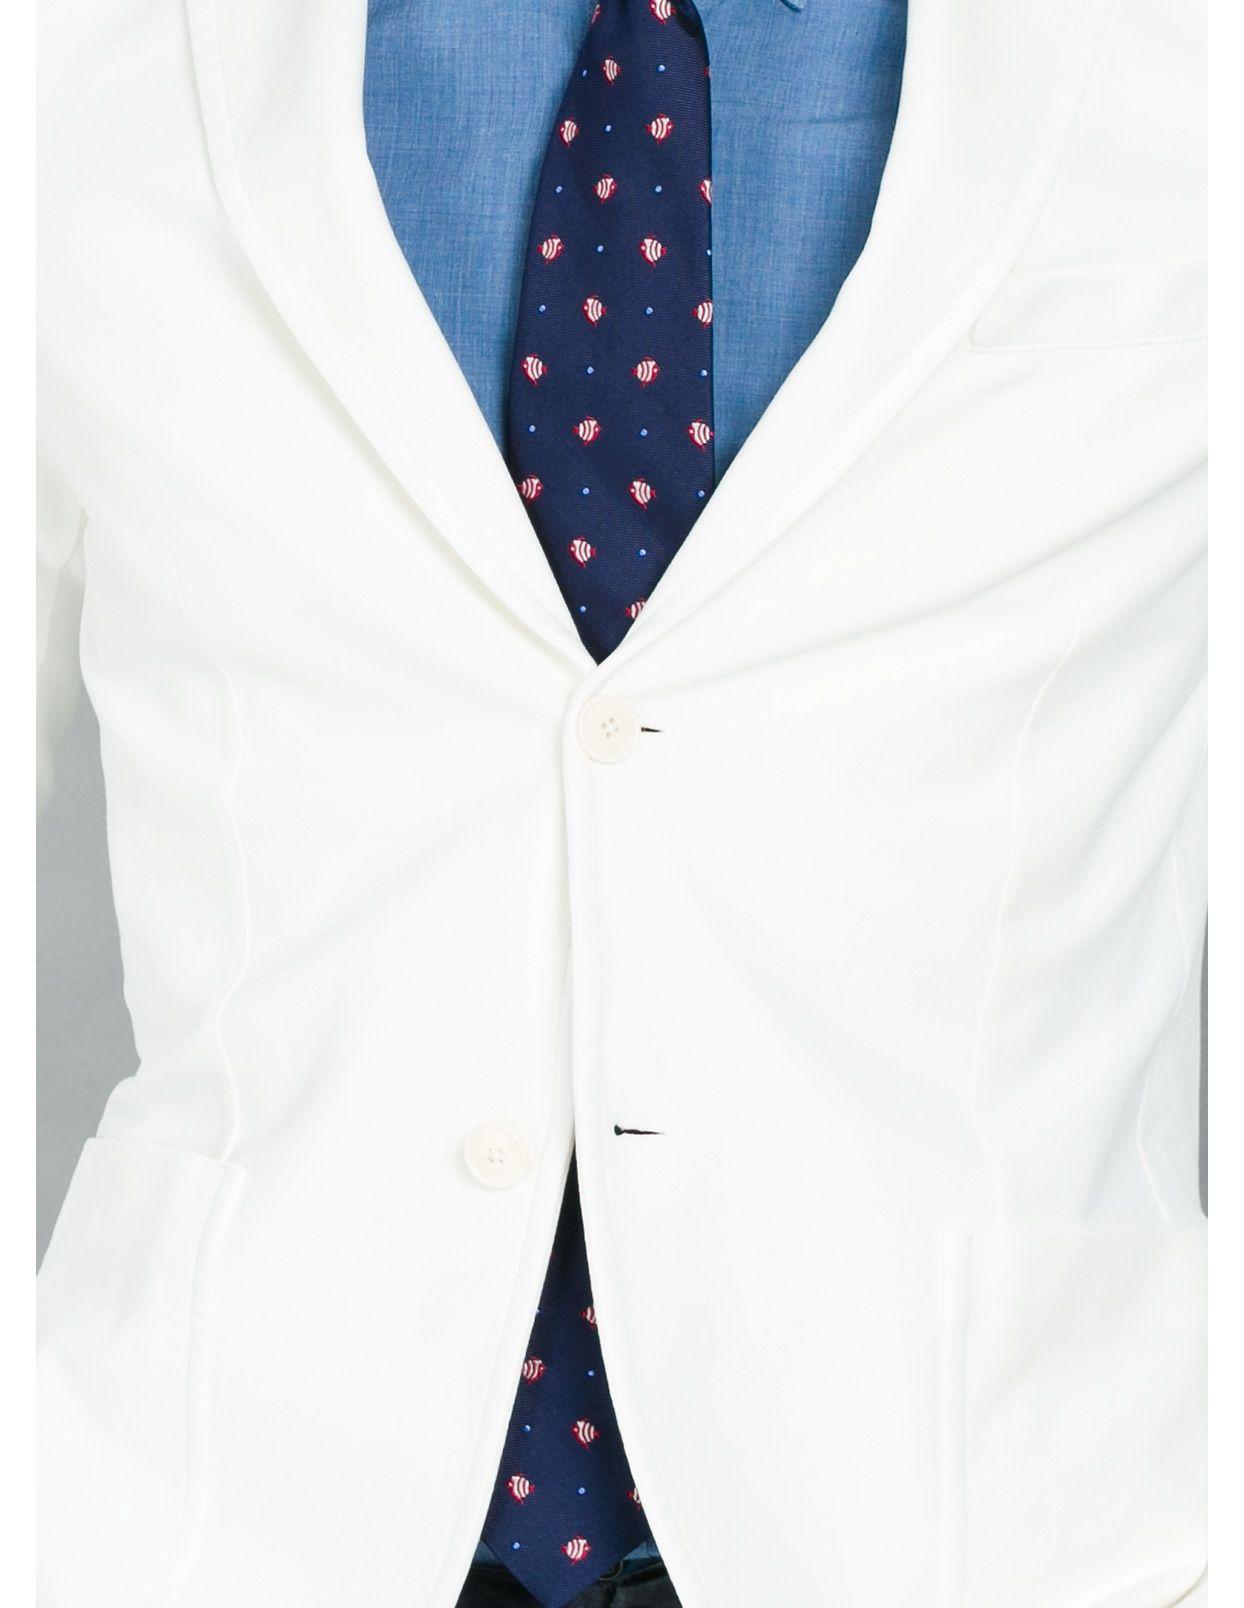 Americana soft 2 botones SLIM FIT color blanco, 95% Algodón 5% Elastán. - Ítem2